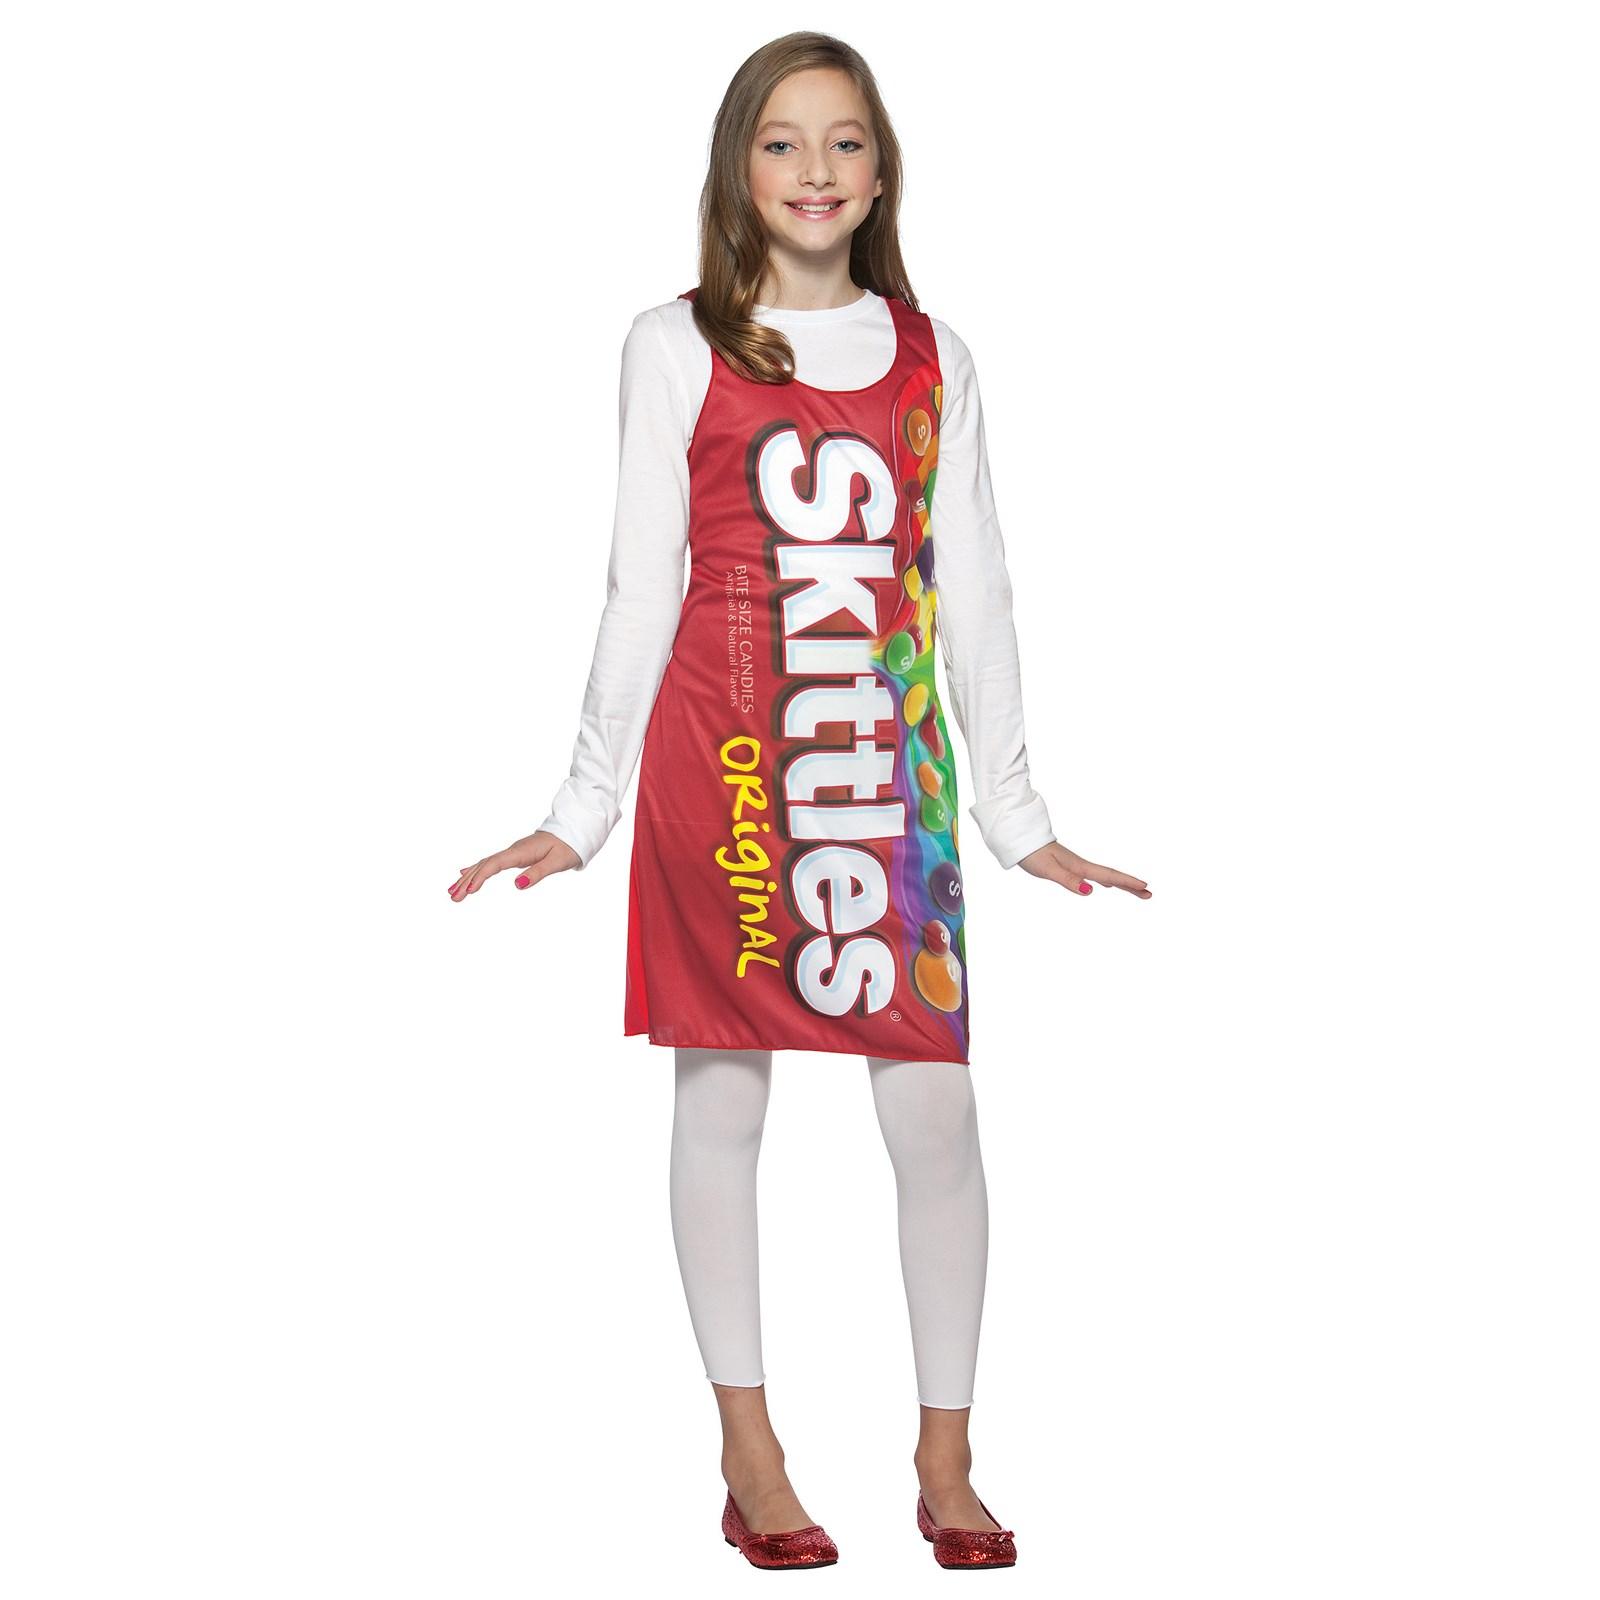 Skittles Tank Dress Tween/Teen Costume | BuyCostumes.com